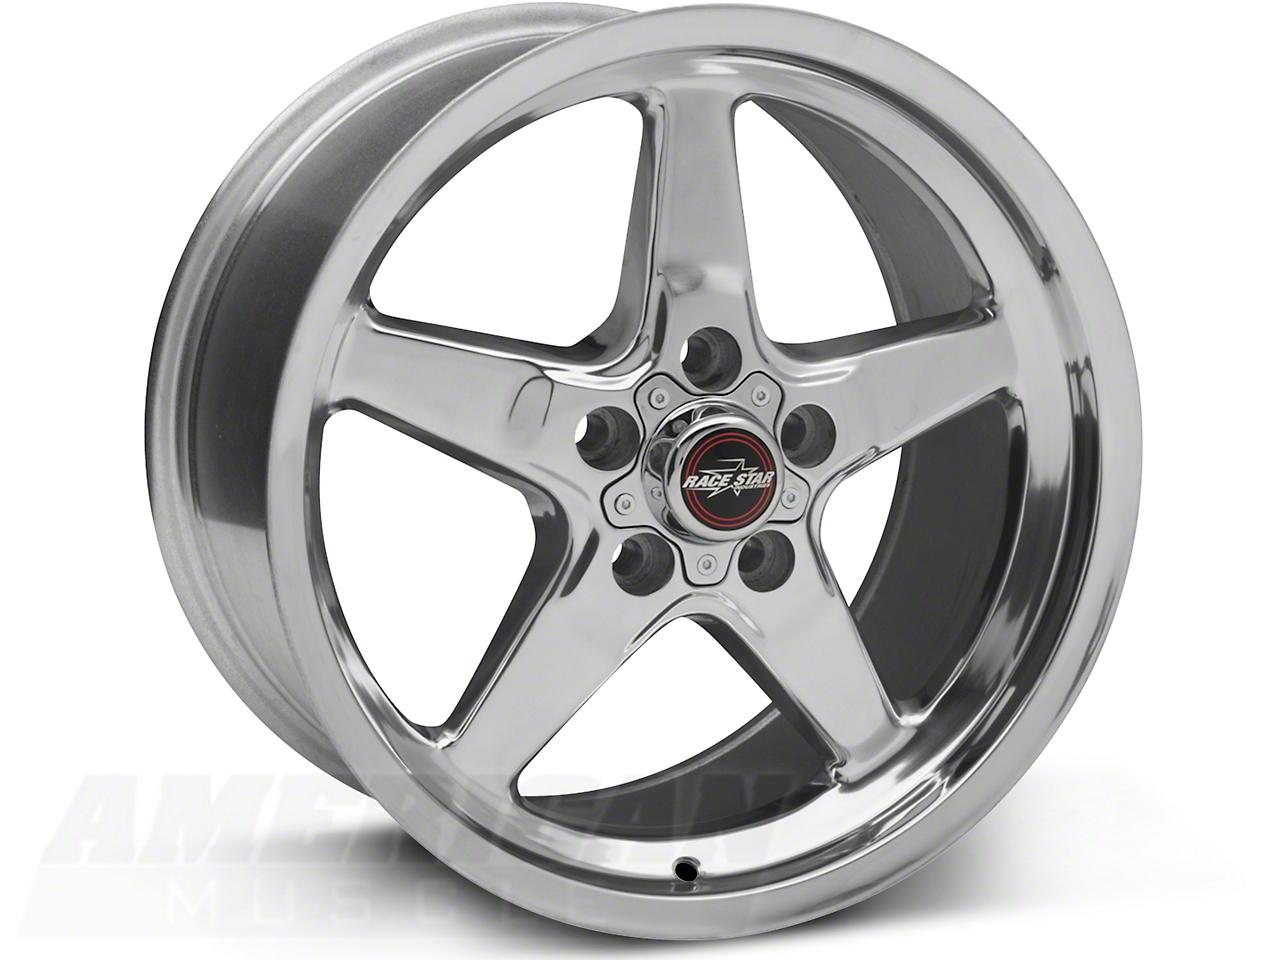 Race Star Drag Wheel - Uni-Lug - 17x9.5 (05-14 GT, V6)